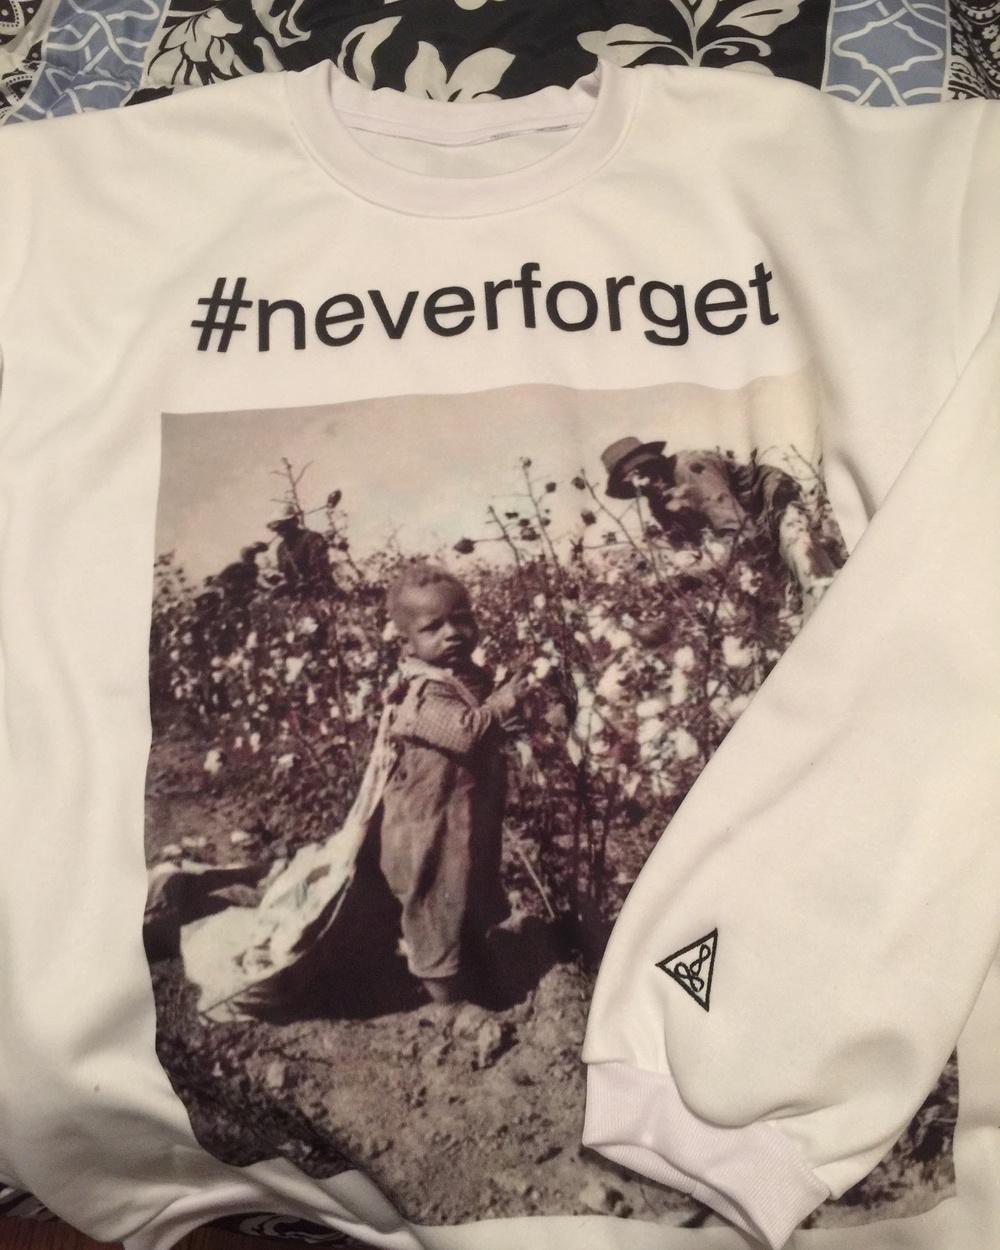 Life Major SweatShirts #Neverforget